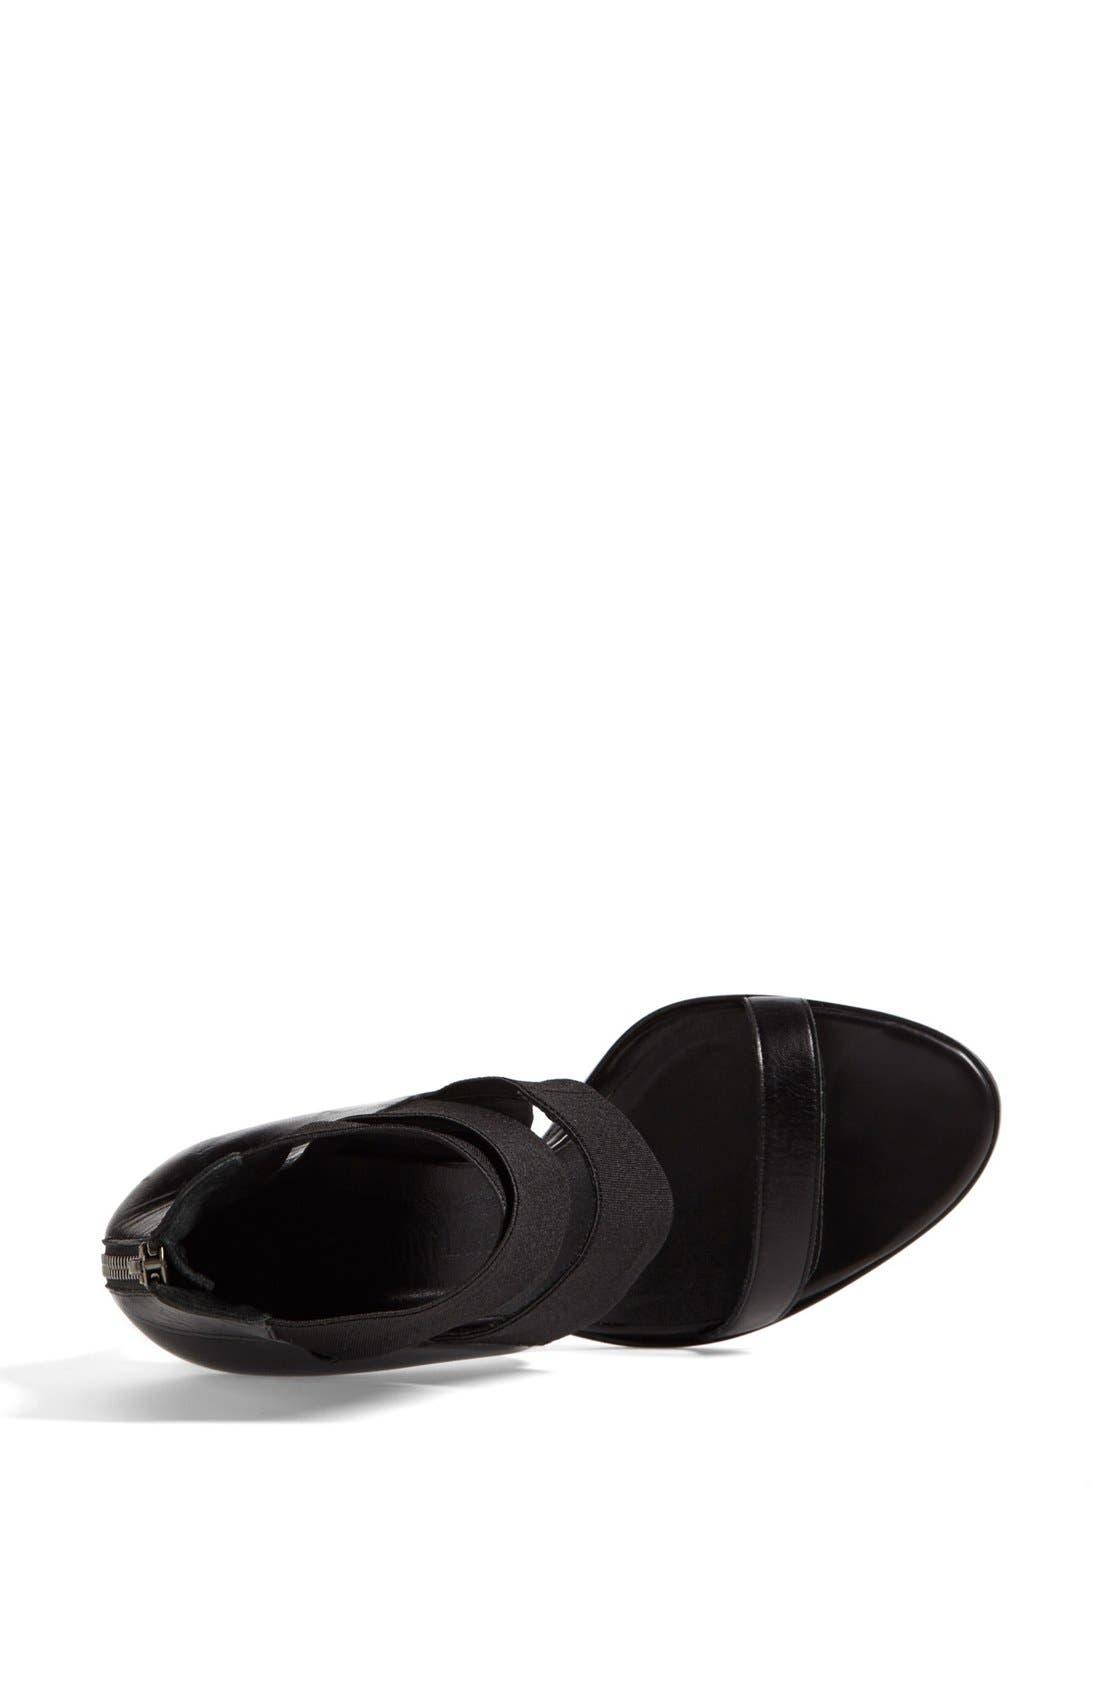 Alternate Image 3  - Helmut Lang 'Silt' Sandal (Online Only)